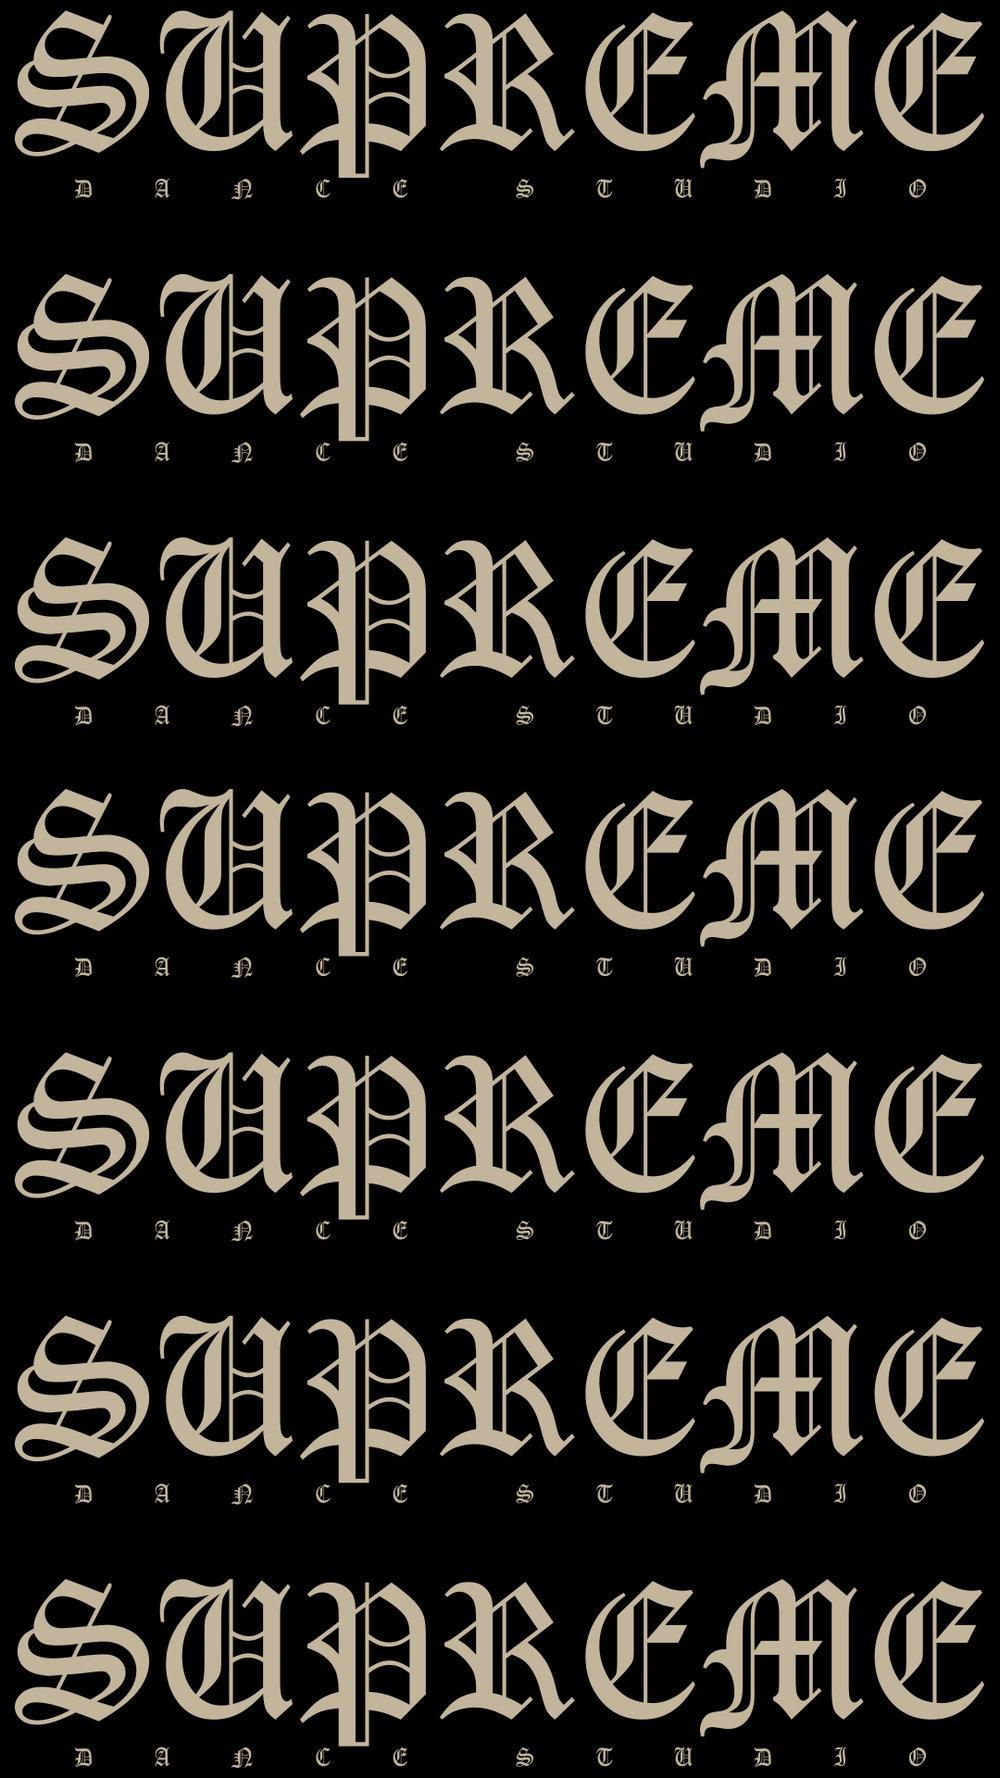 SupremeBG3.jpg